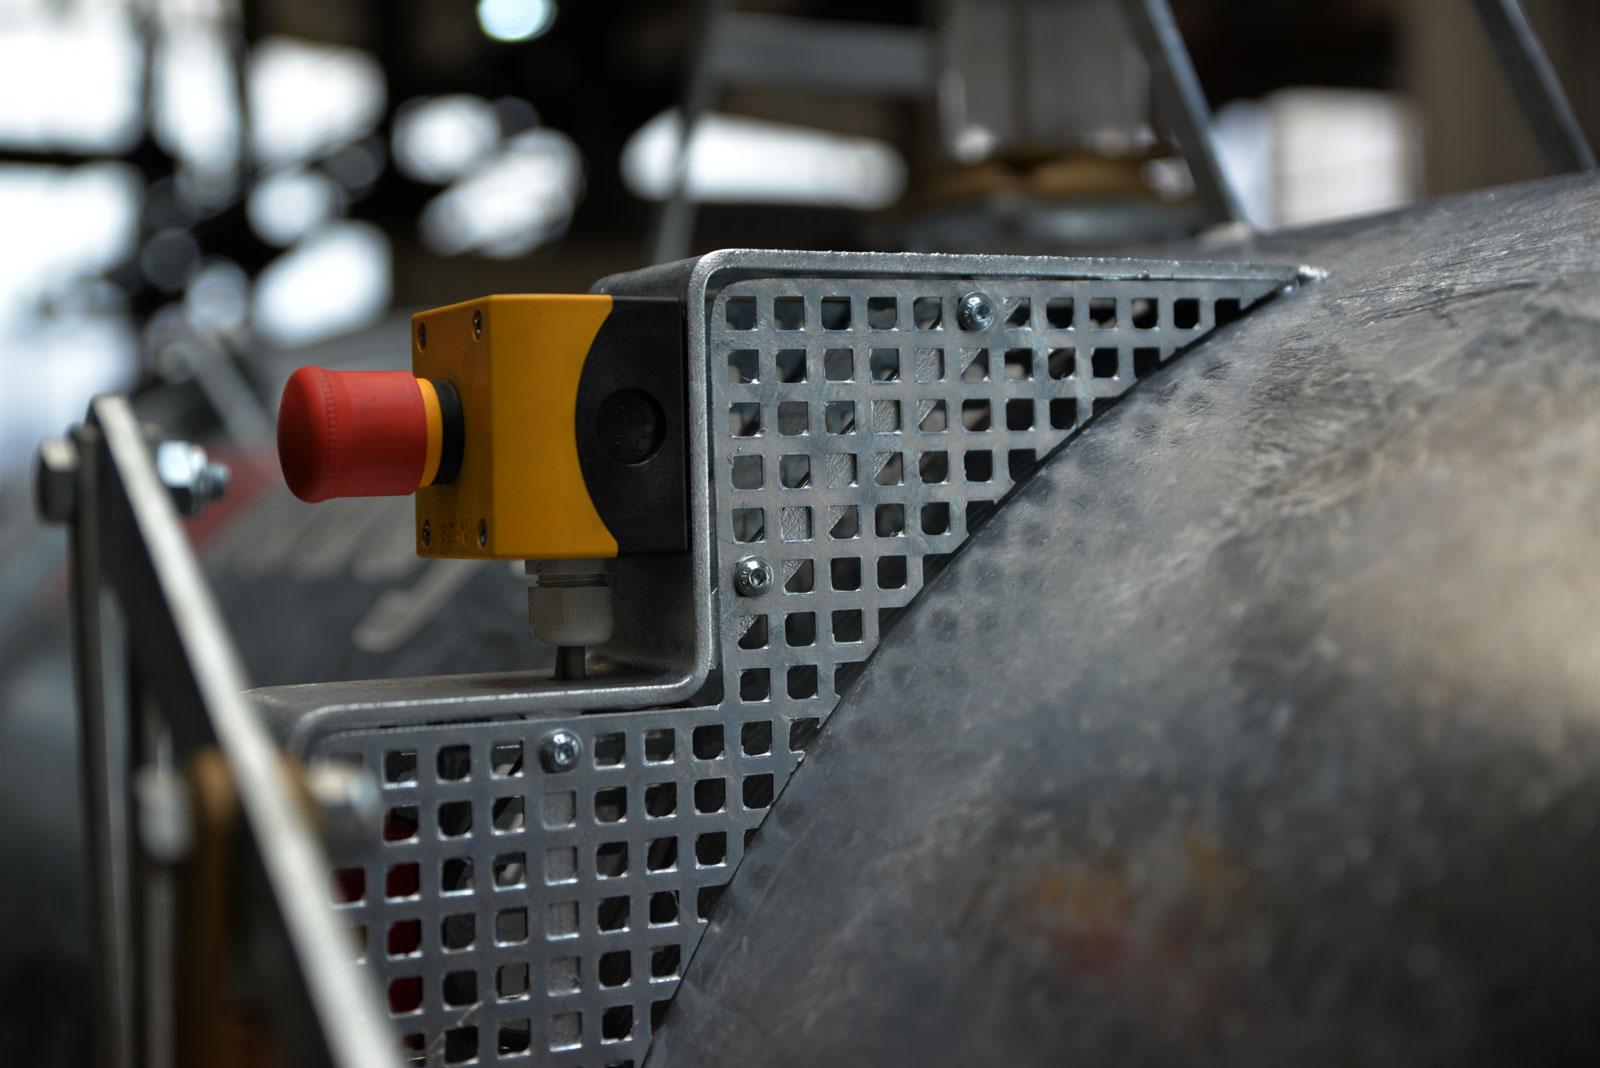 Sauganhänger Pull Caddy - Metallo Pull Saugfass